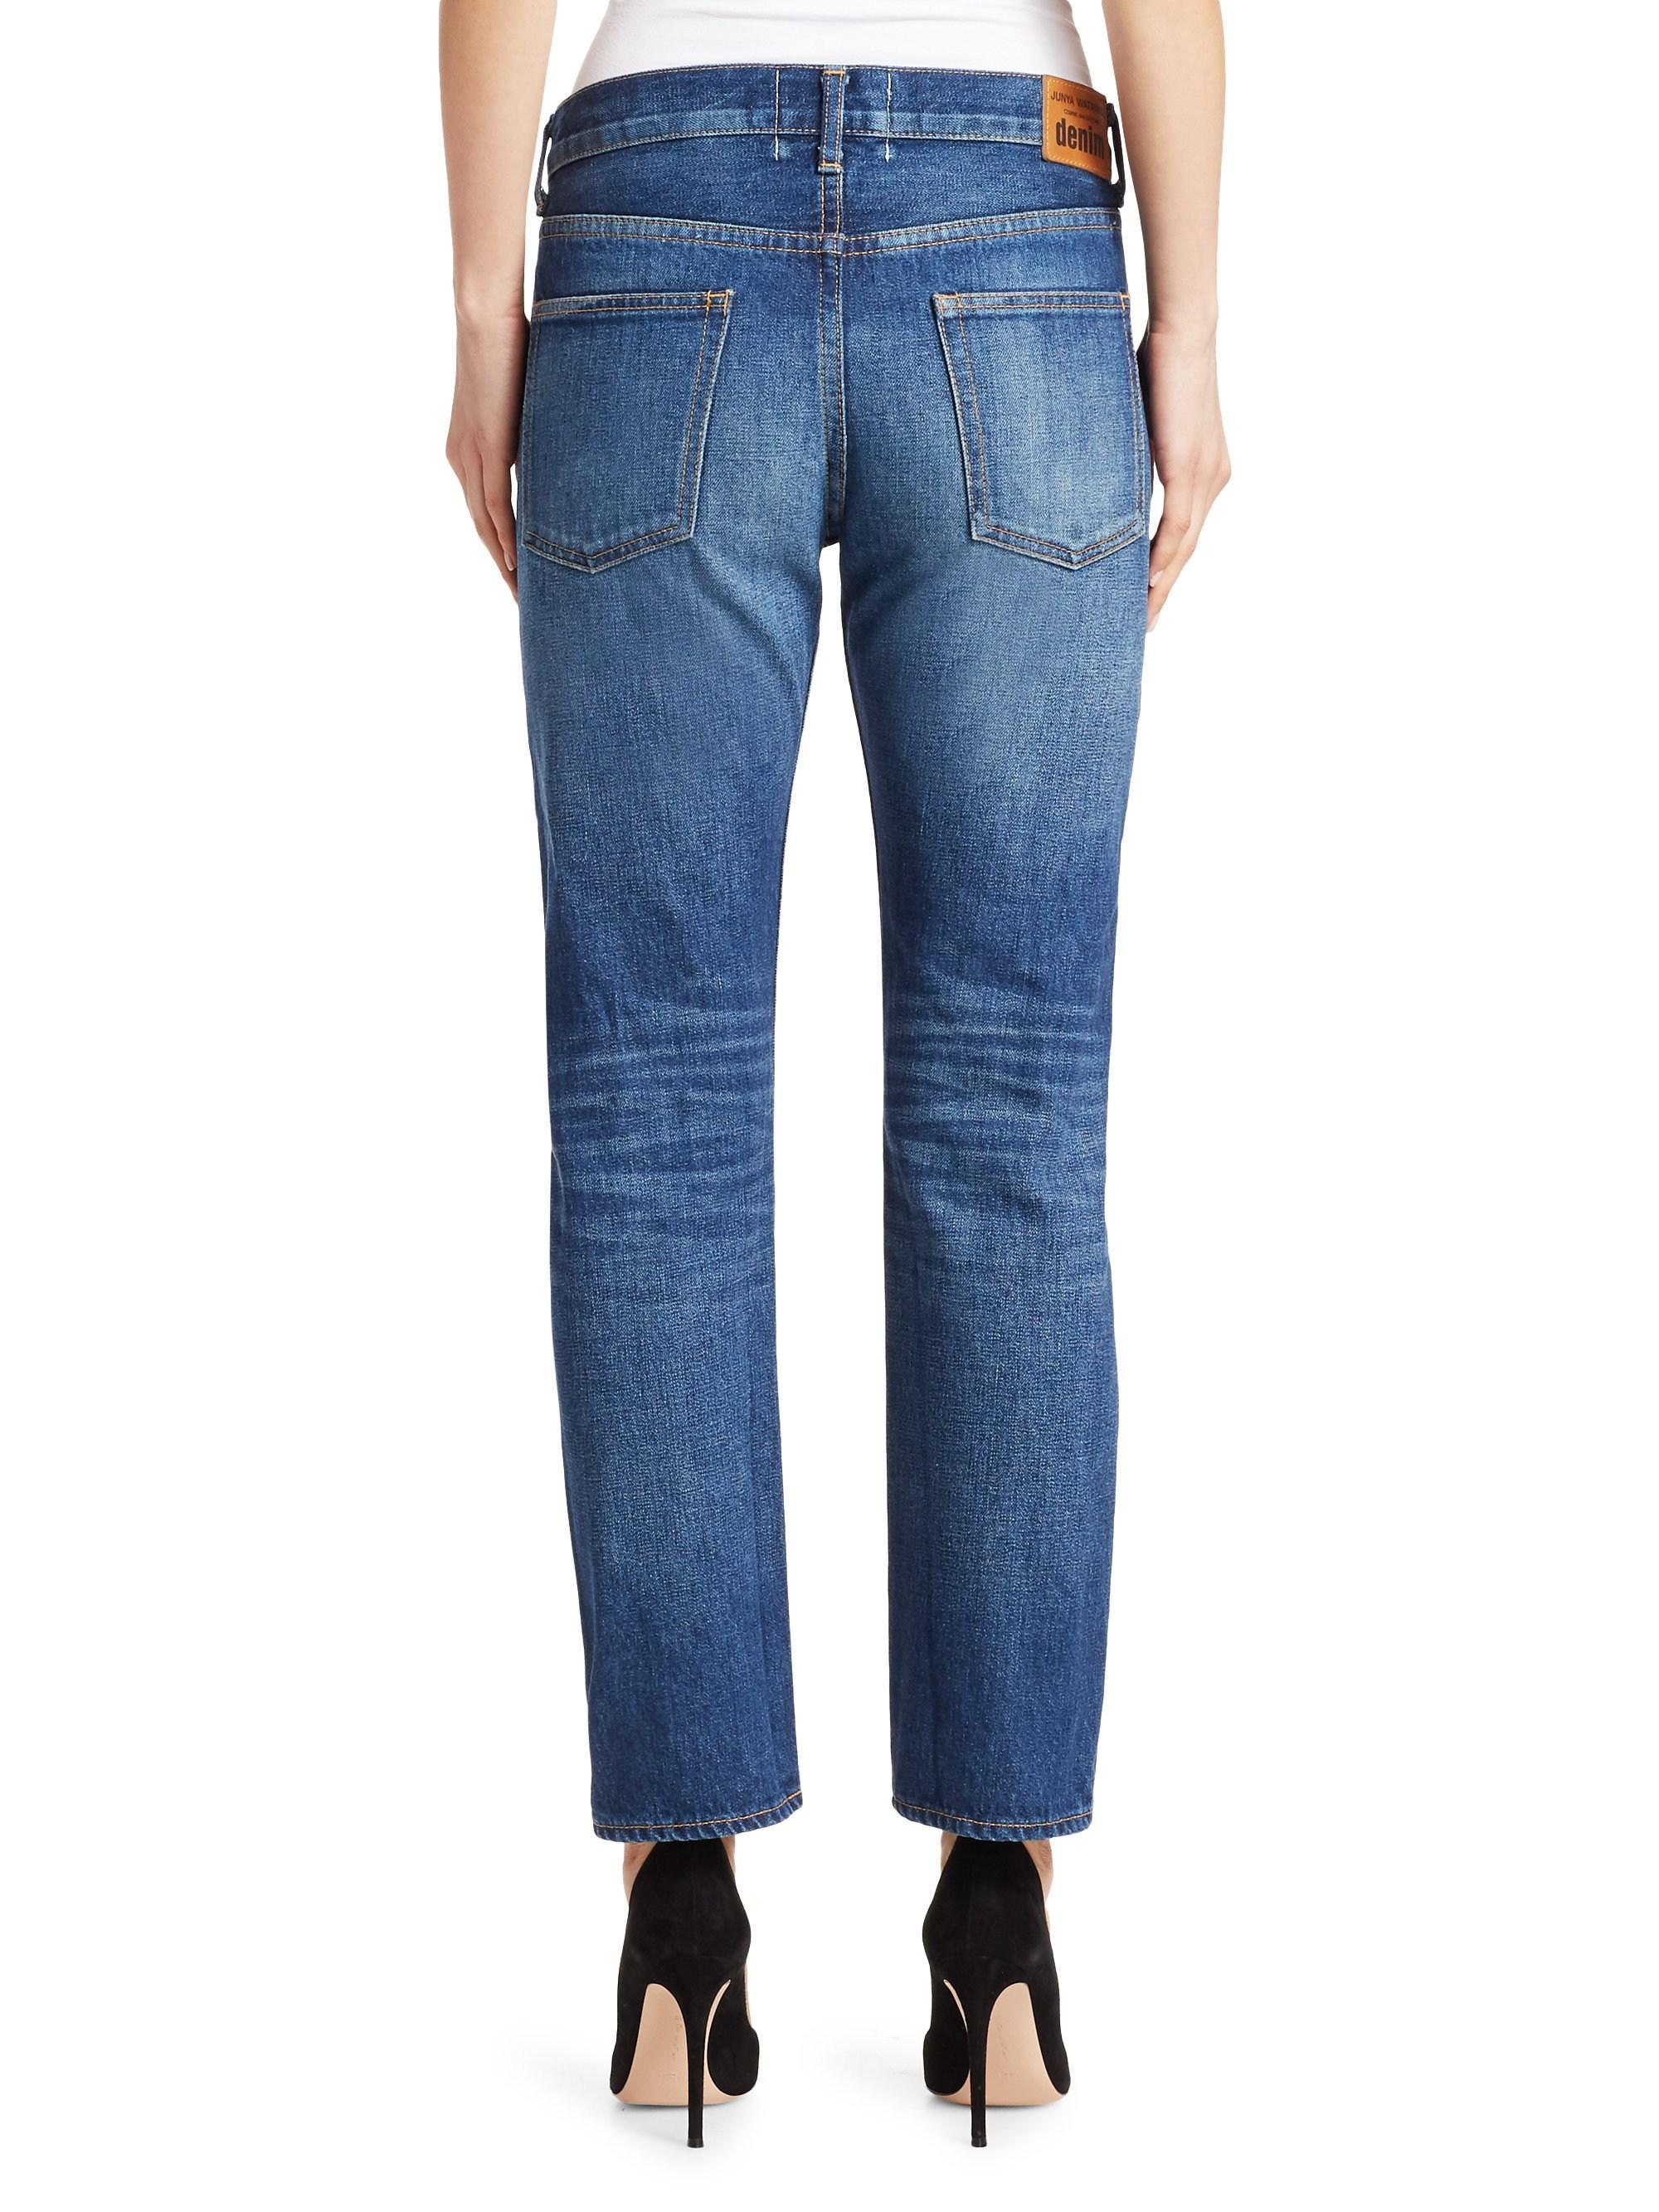 6190c91e2437d Junya Watanabe Patchwork Lace Selvedge Denim Jeans in Blue - Lyst